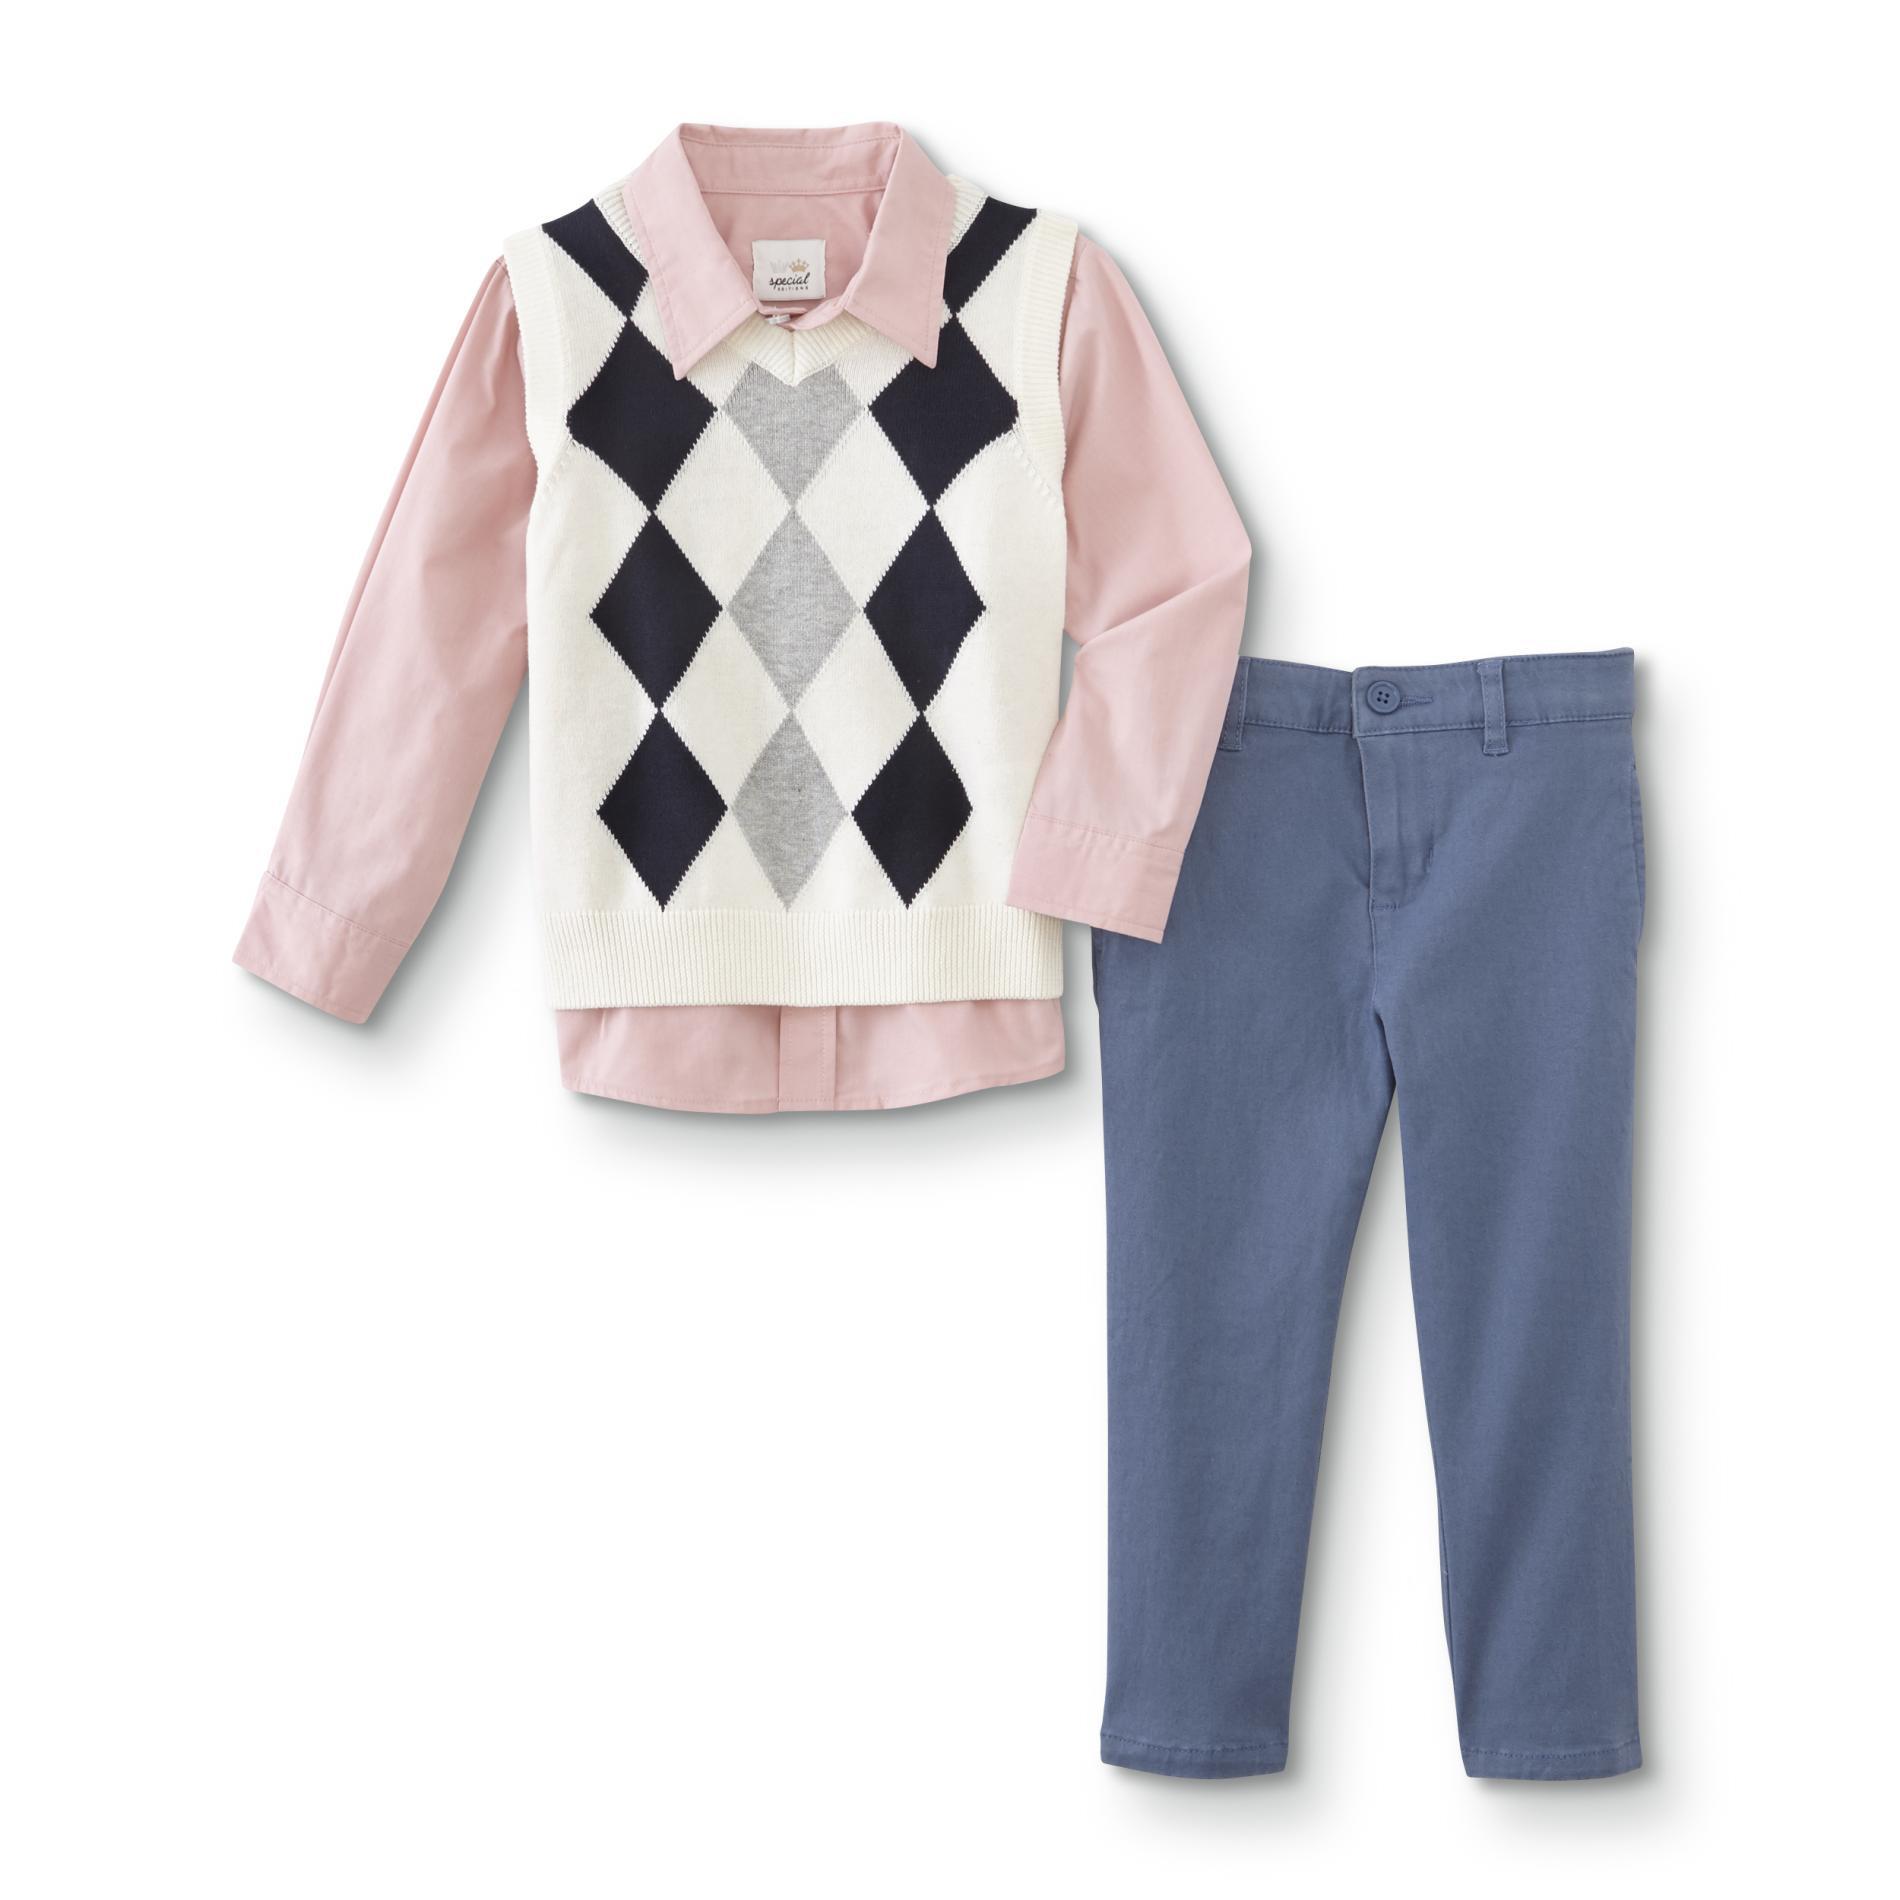 WonderKids Infant and Toddler Boys' Shirt, Vest & Pants, Size: 4T, Multi-color